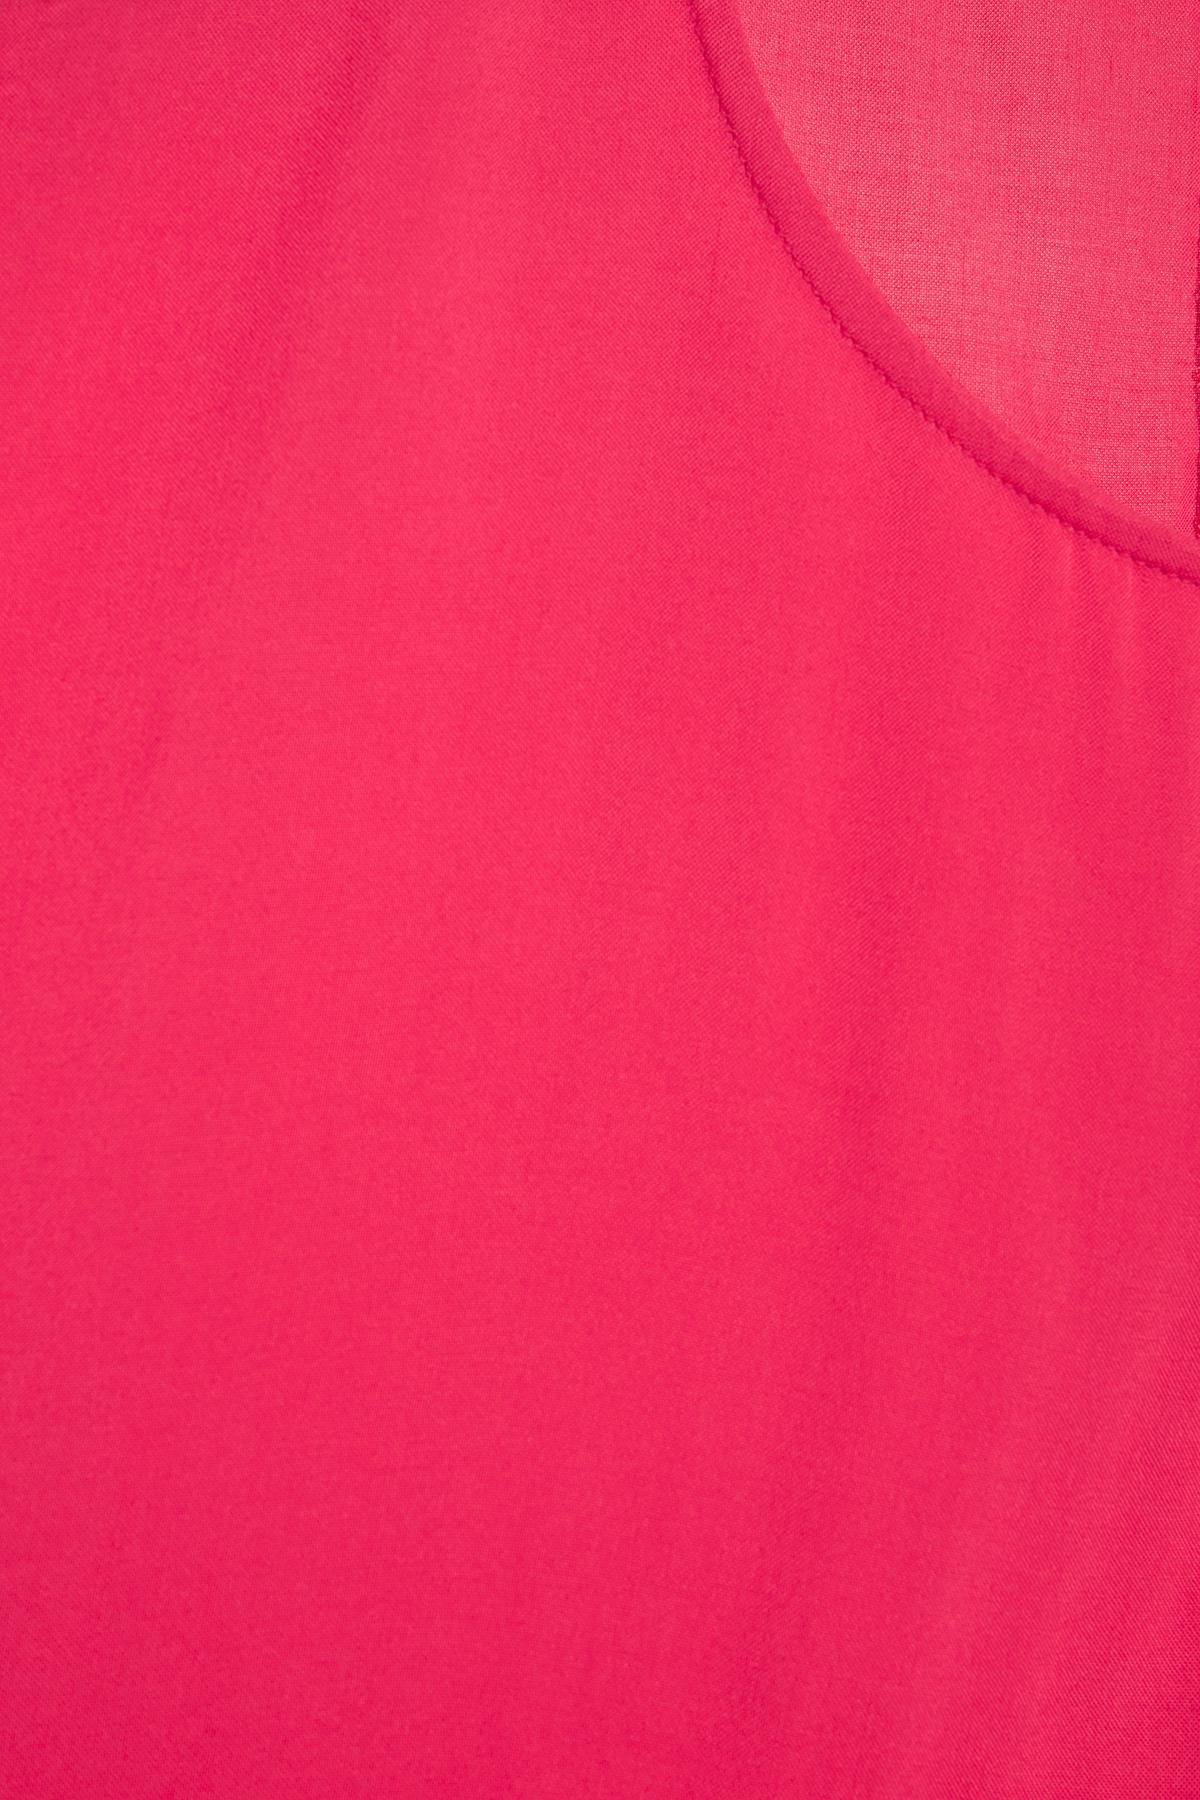 Framboosrood Blouse met korte mouwen van b.young – Door Framboosrood Blouse met korte mouwen van maat. 34-46 hier